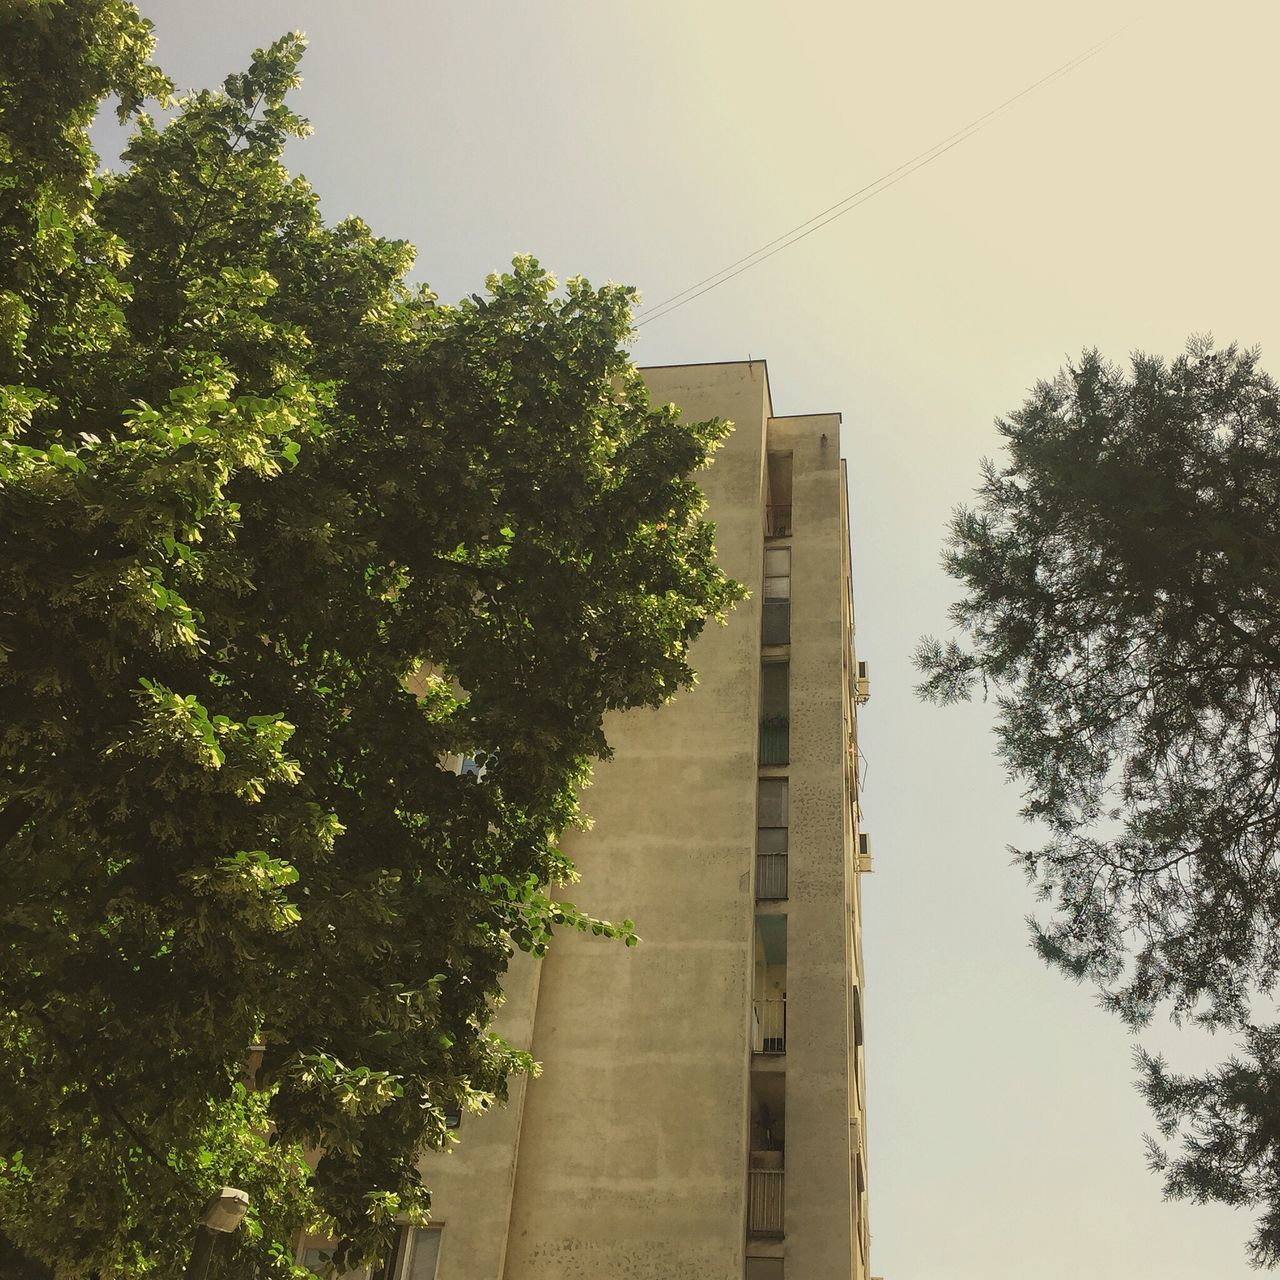 Neki Tb tb šo bi se reklo Jun Sunny Day Streetphotography Drivebyphotography